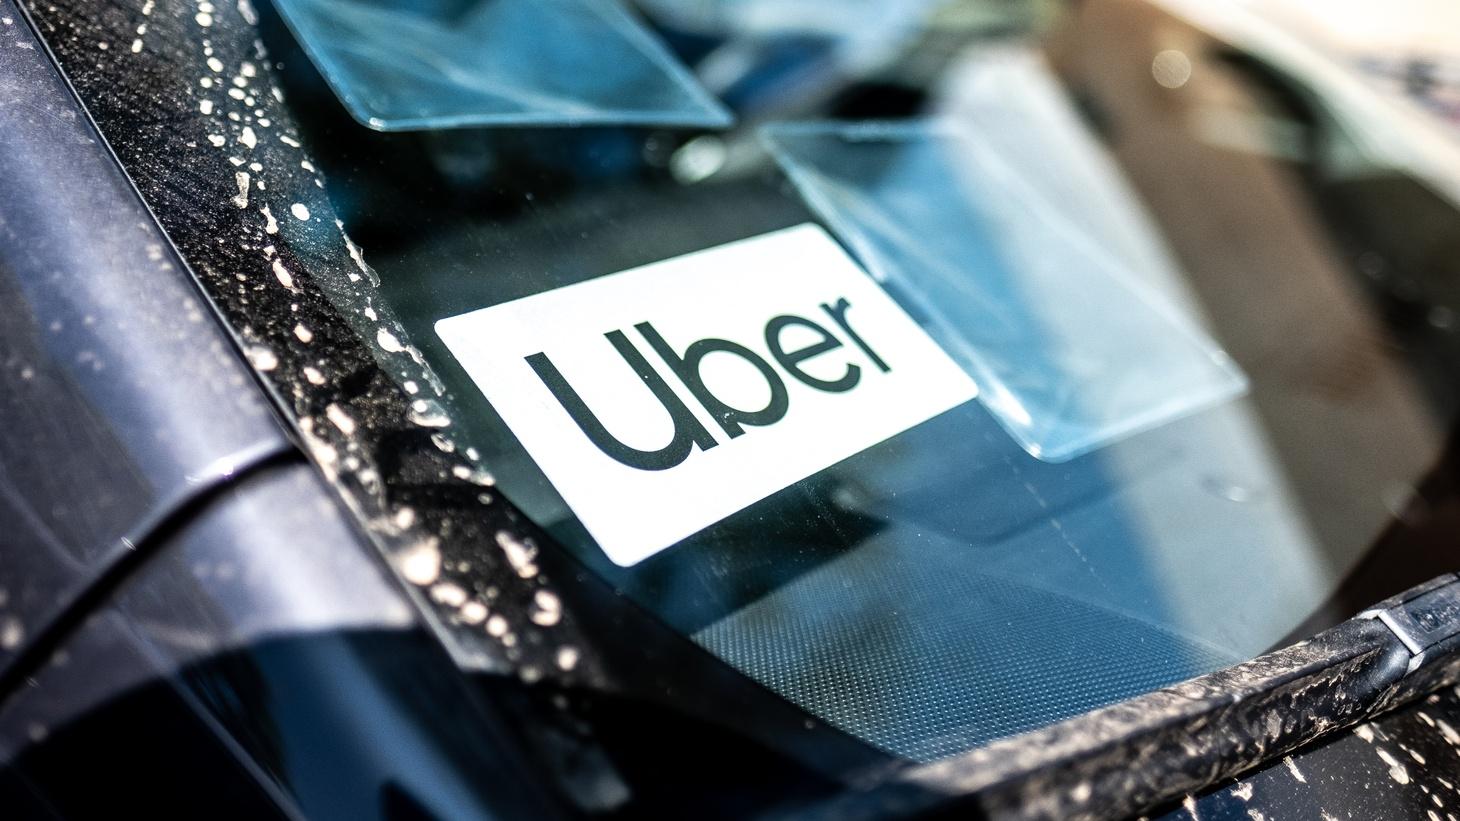 Uber sticker on a car windshield, Culver City, June 28, 2019.